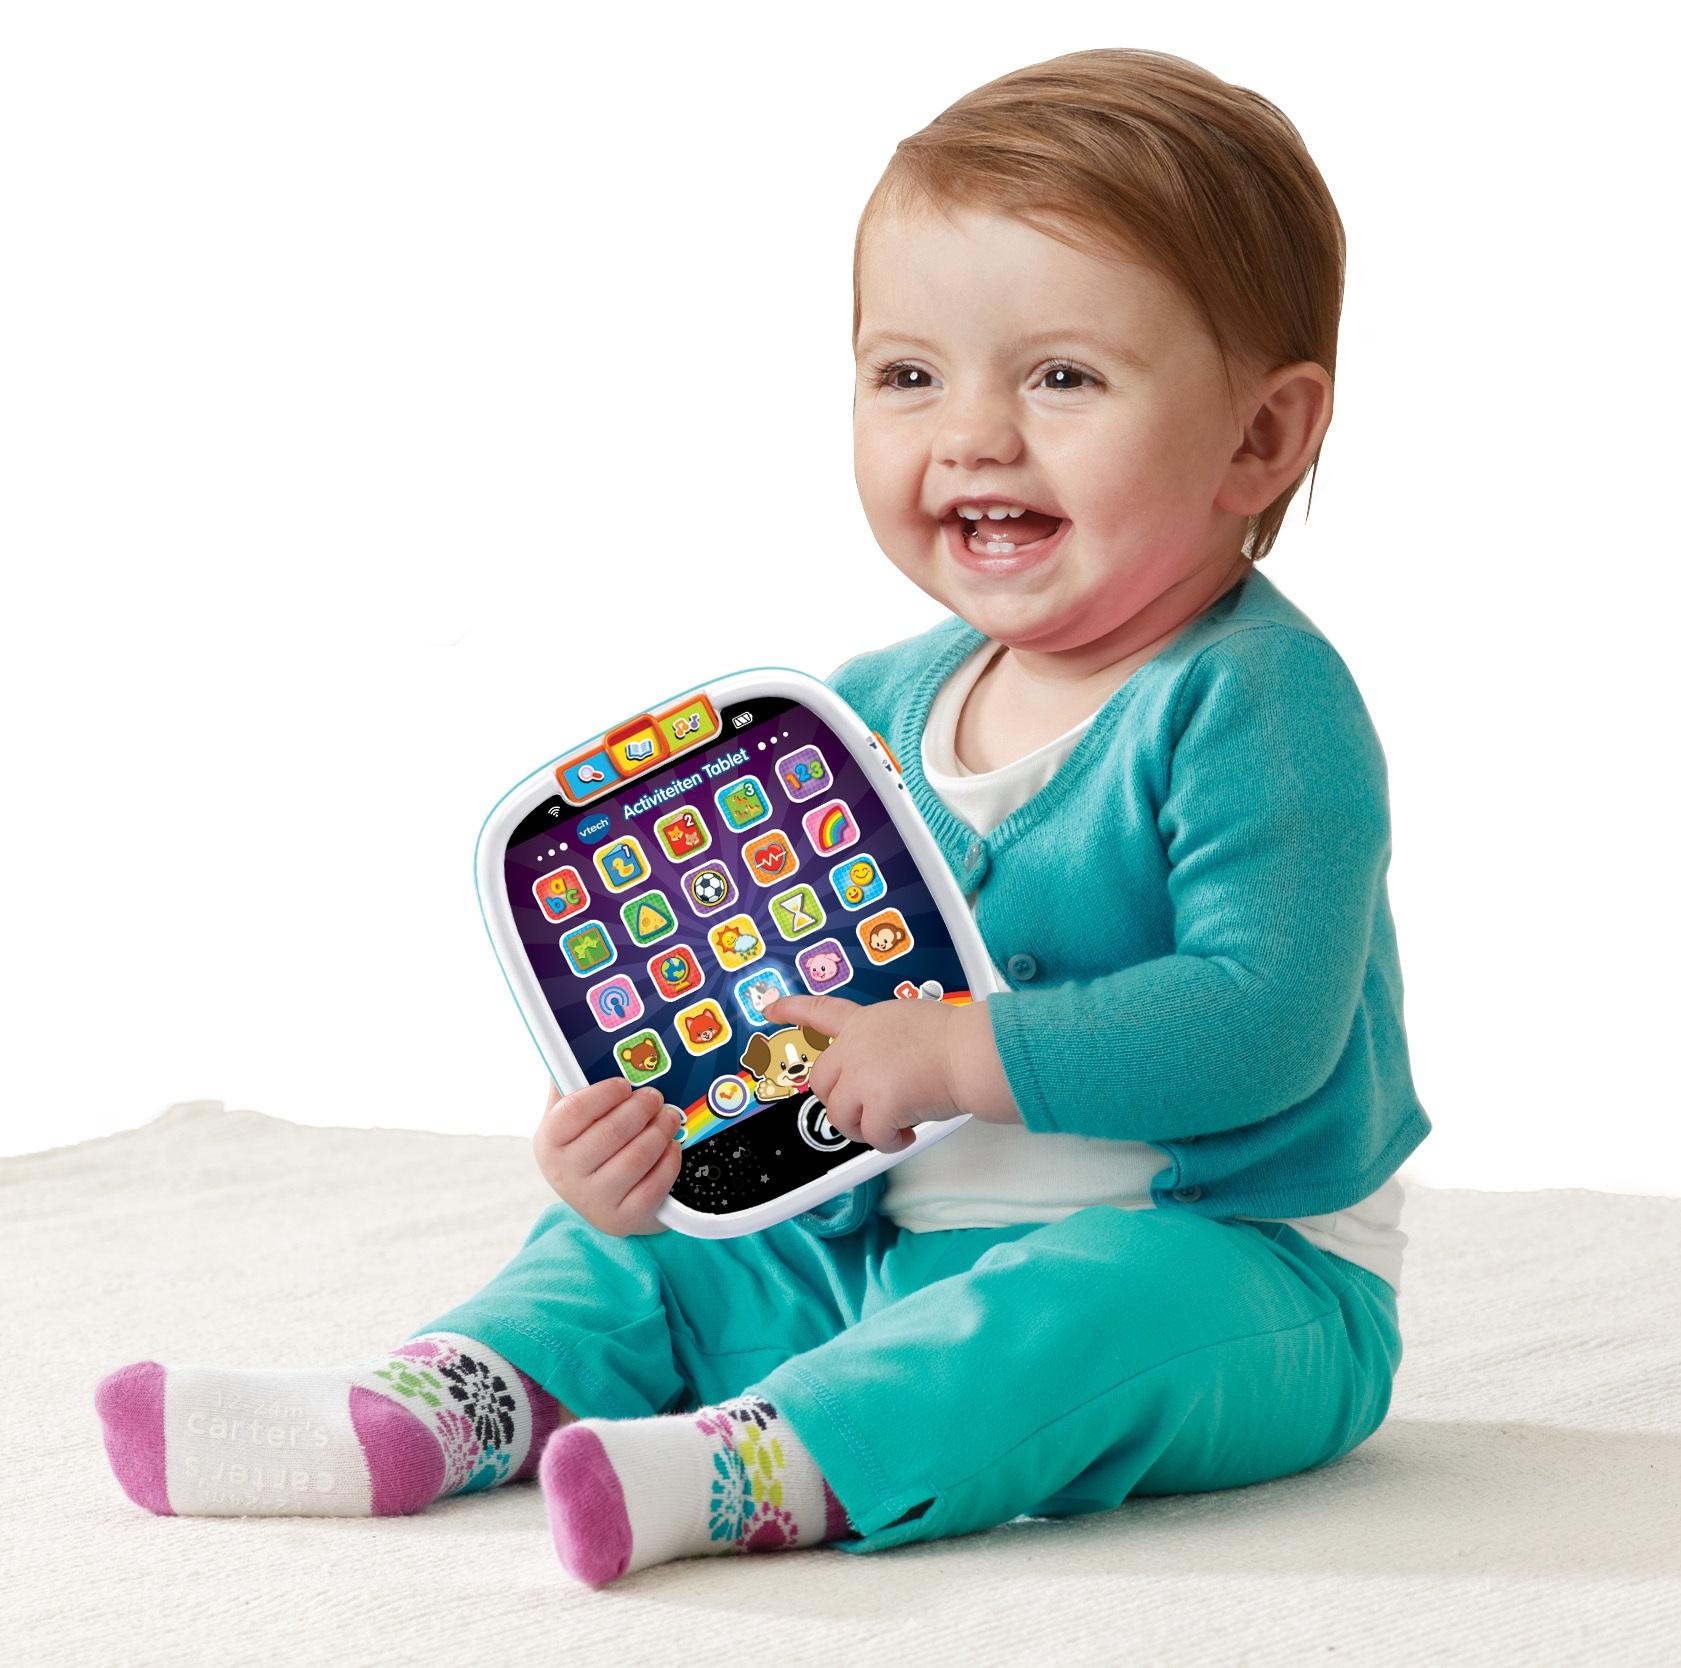 VTech Baby Activiteiten Tablet Ragazzo/Ragazza giocattolo educativo